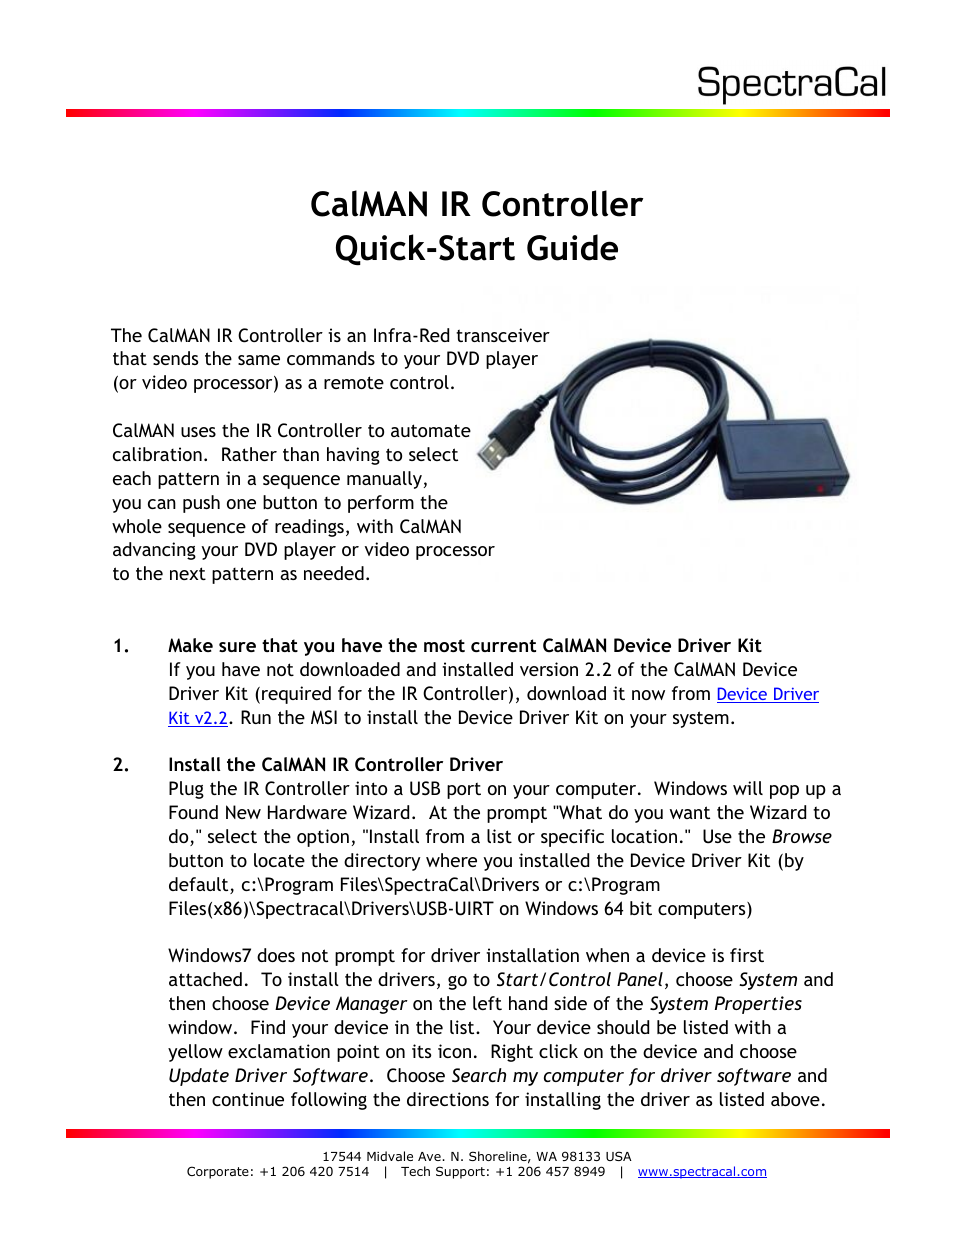 SpectraCal CalMAN IR Controller User Manual | 2 pages